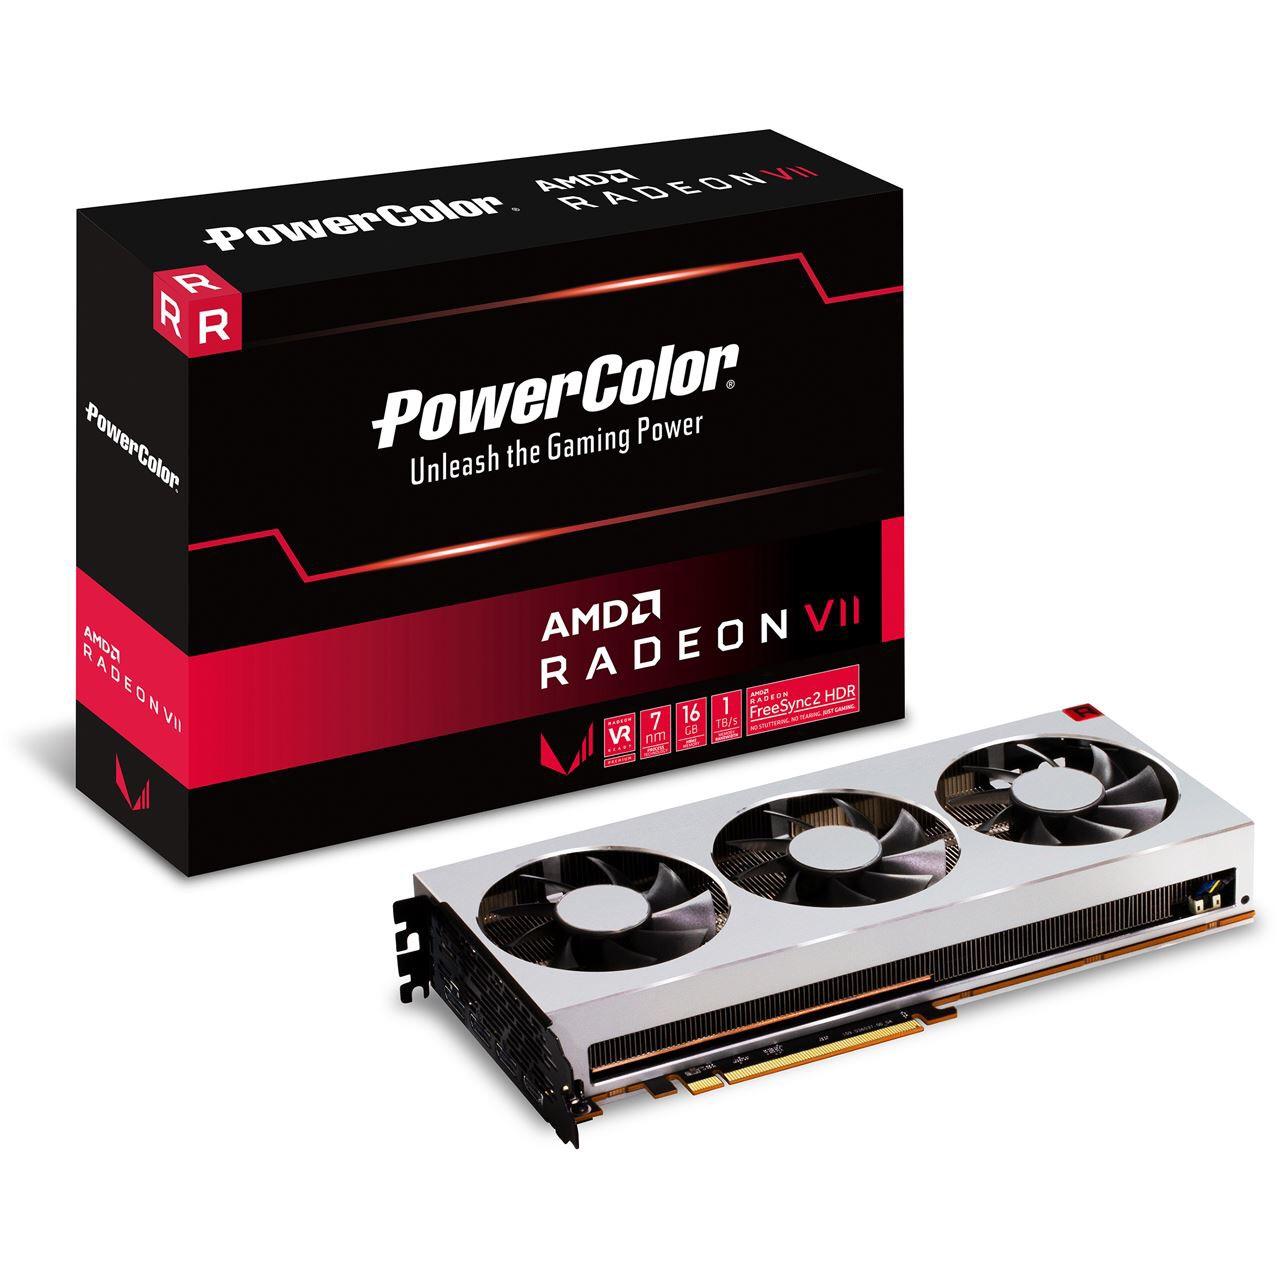 16GB PowerColor Radeon VII